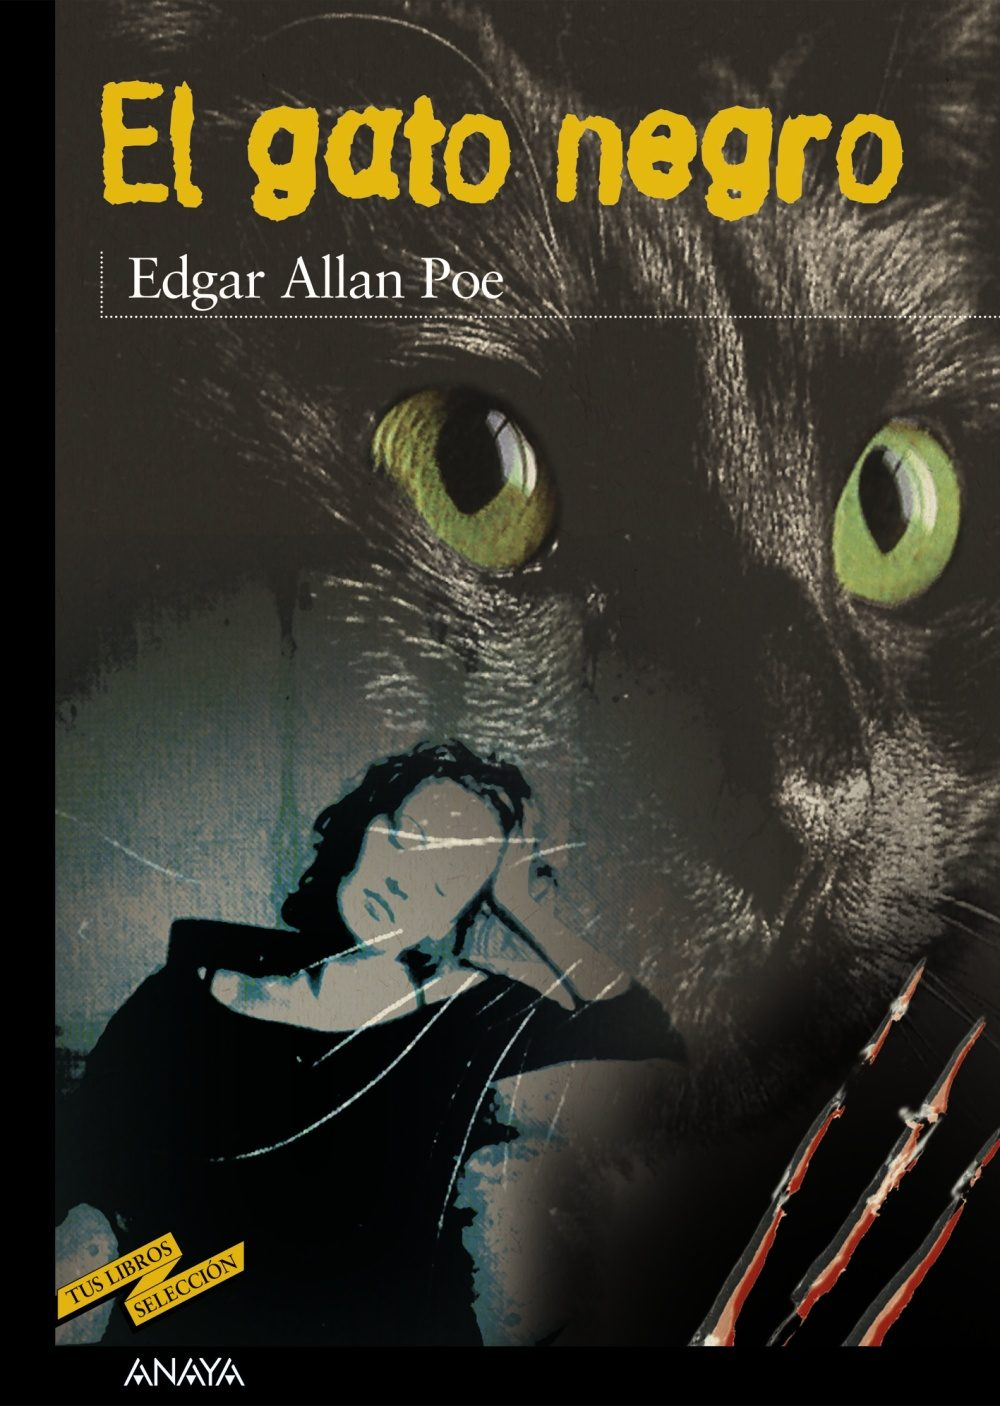 EL GATO NEGRO | EDGAR ALLAN POE | OhLibro